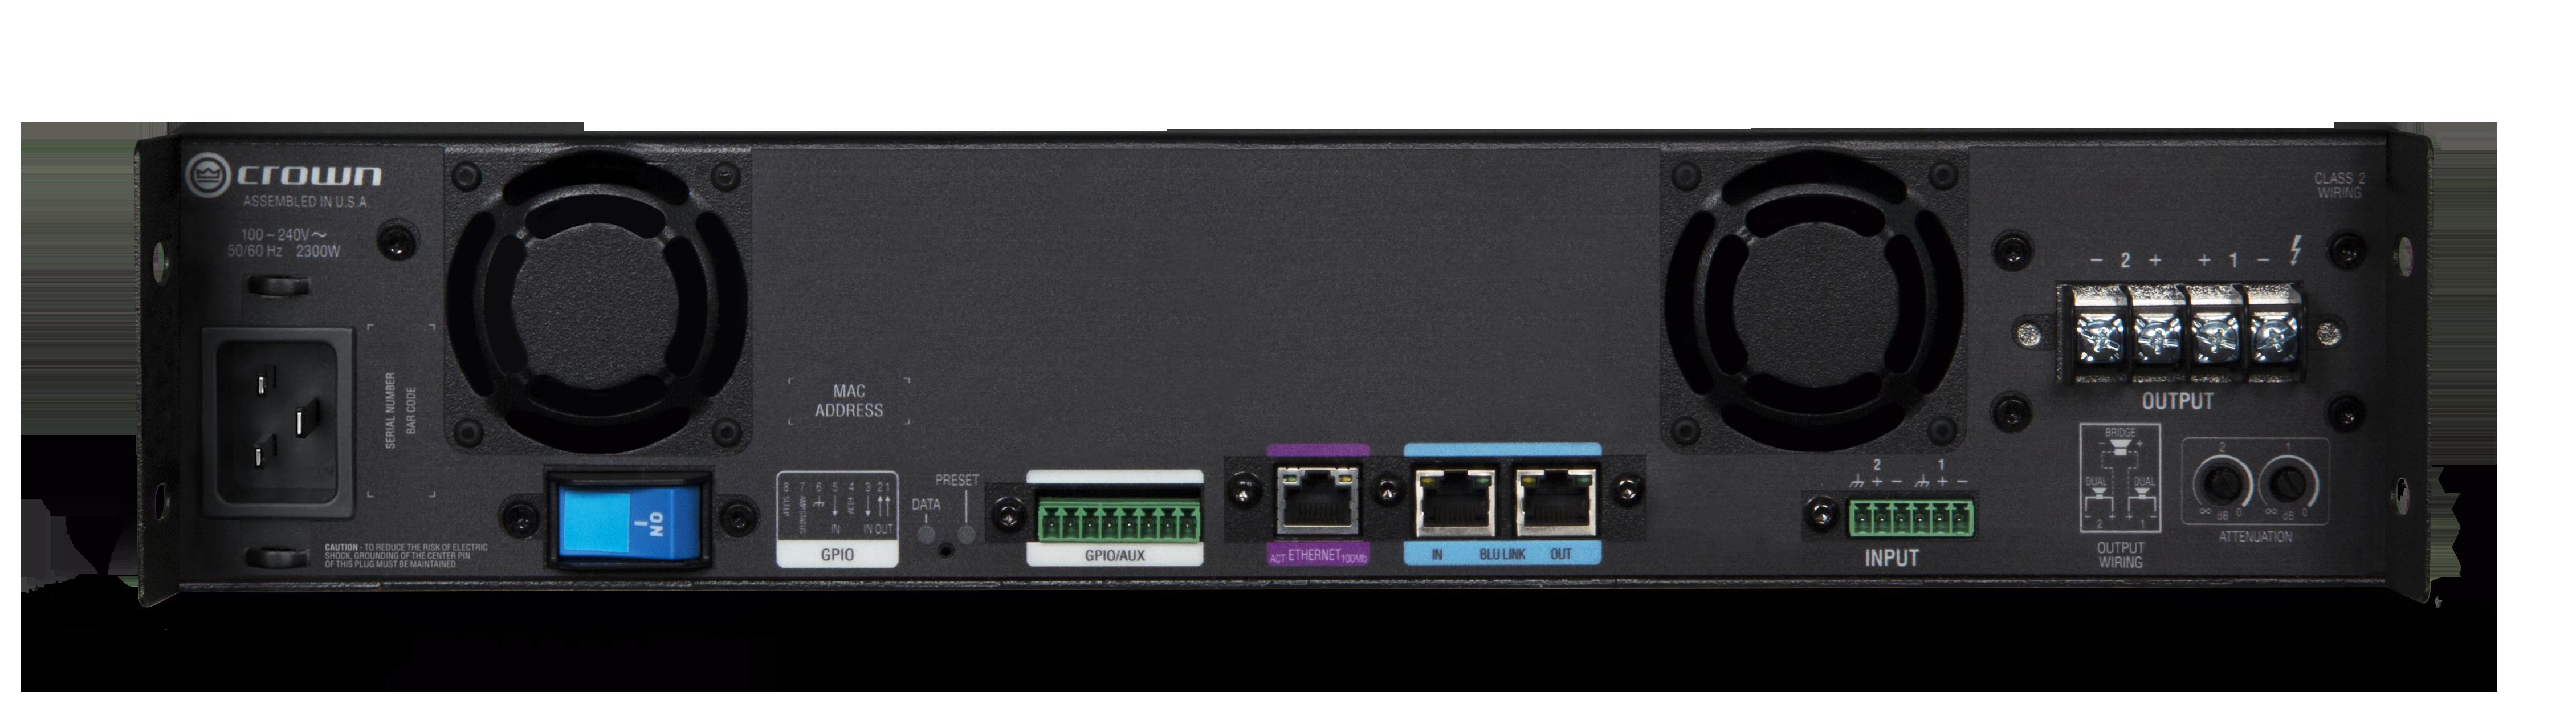 dci 2 2400n crown audio professional power amplifiers rh crownaudio com Class 2 Electrical Wiring Class 2 Circuits